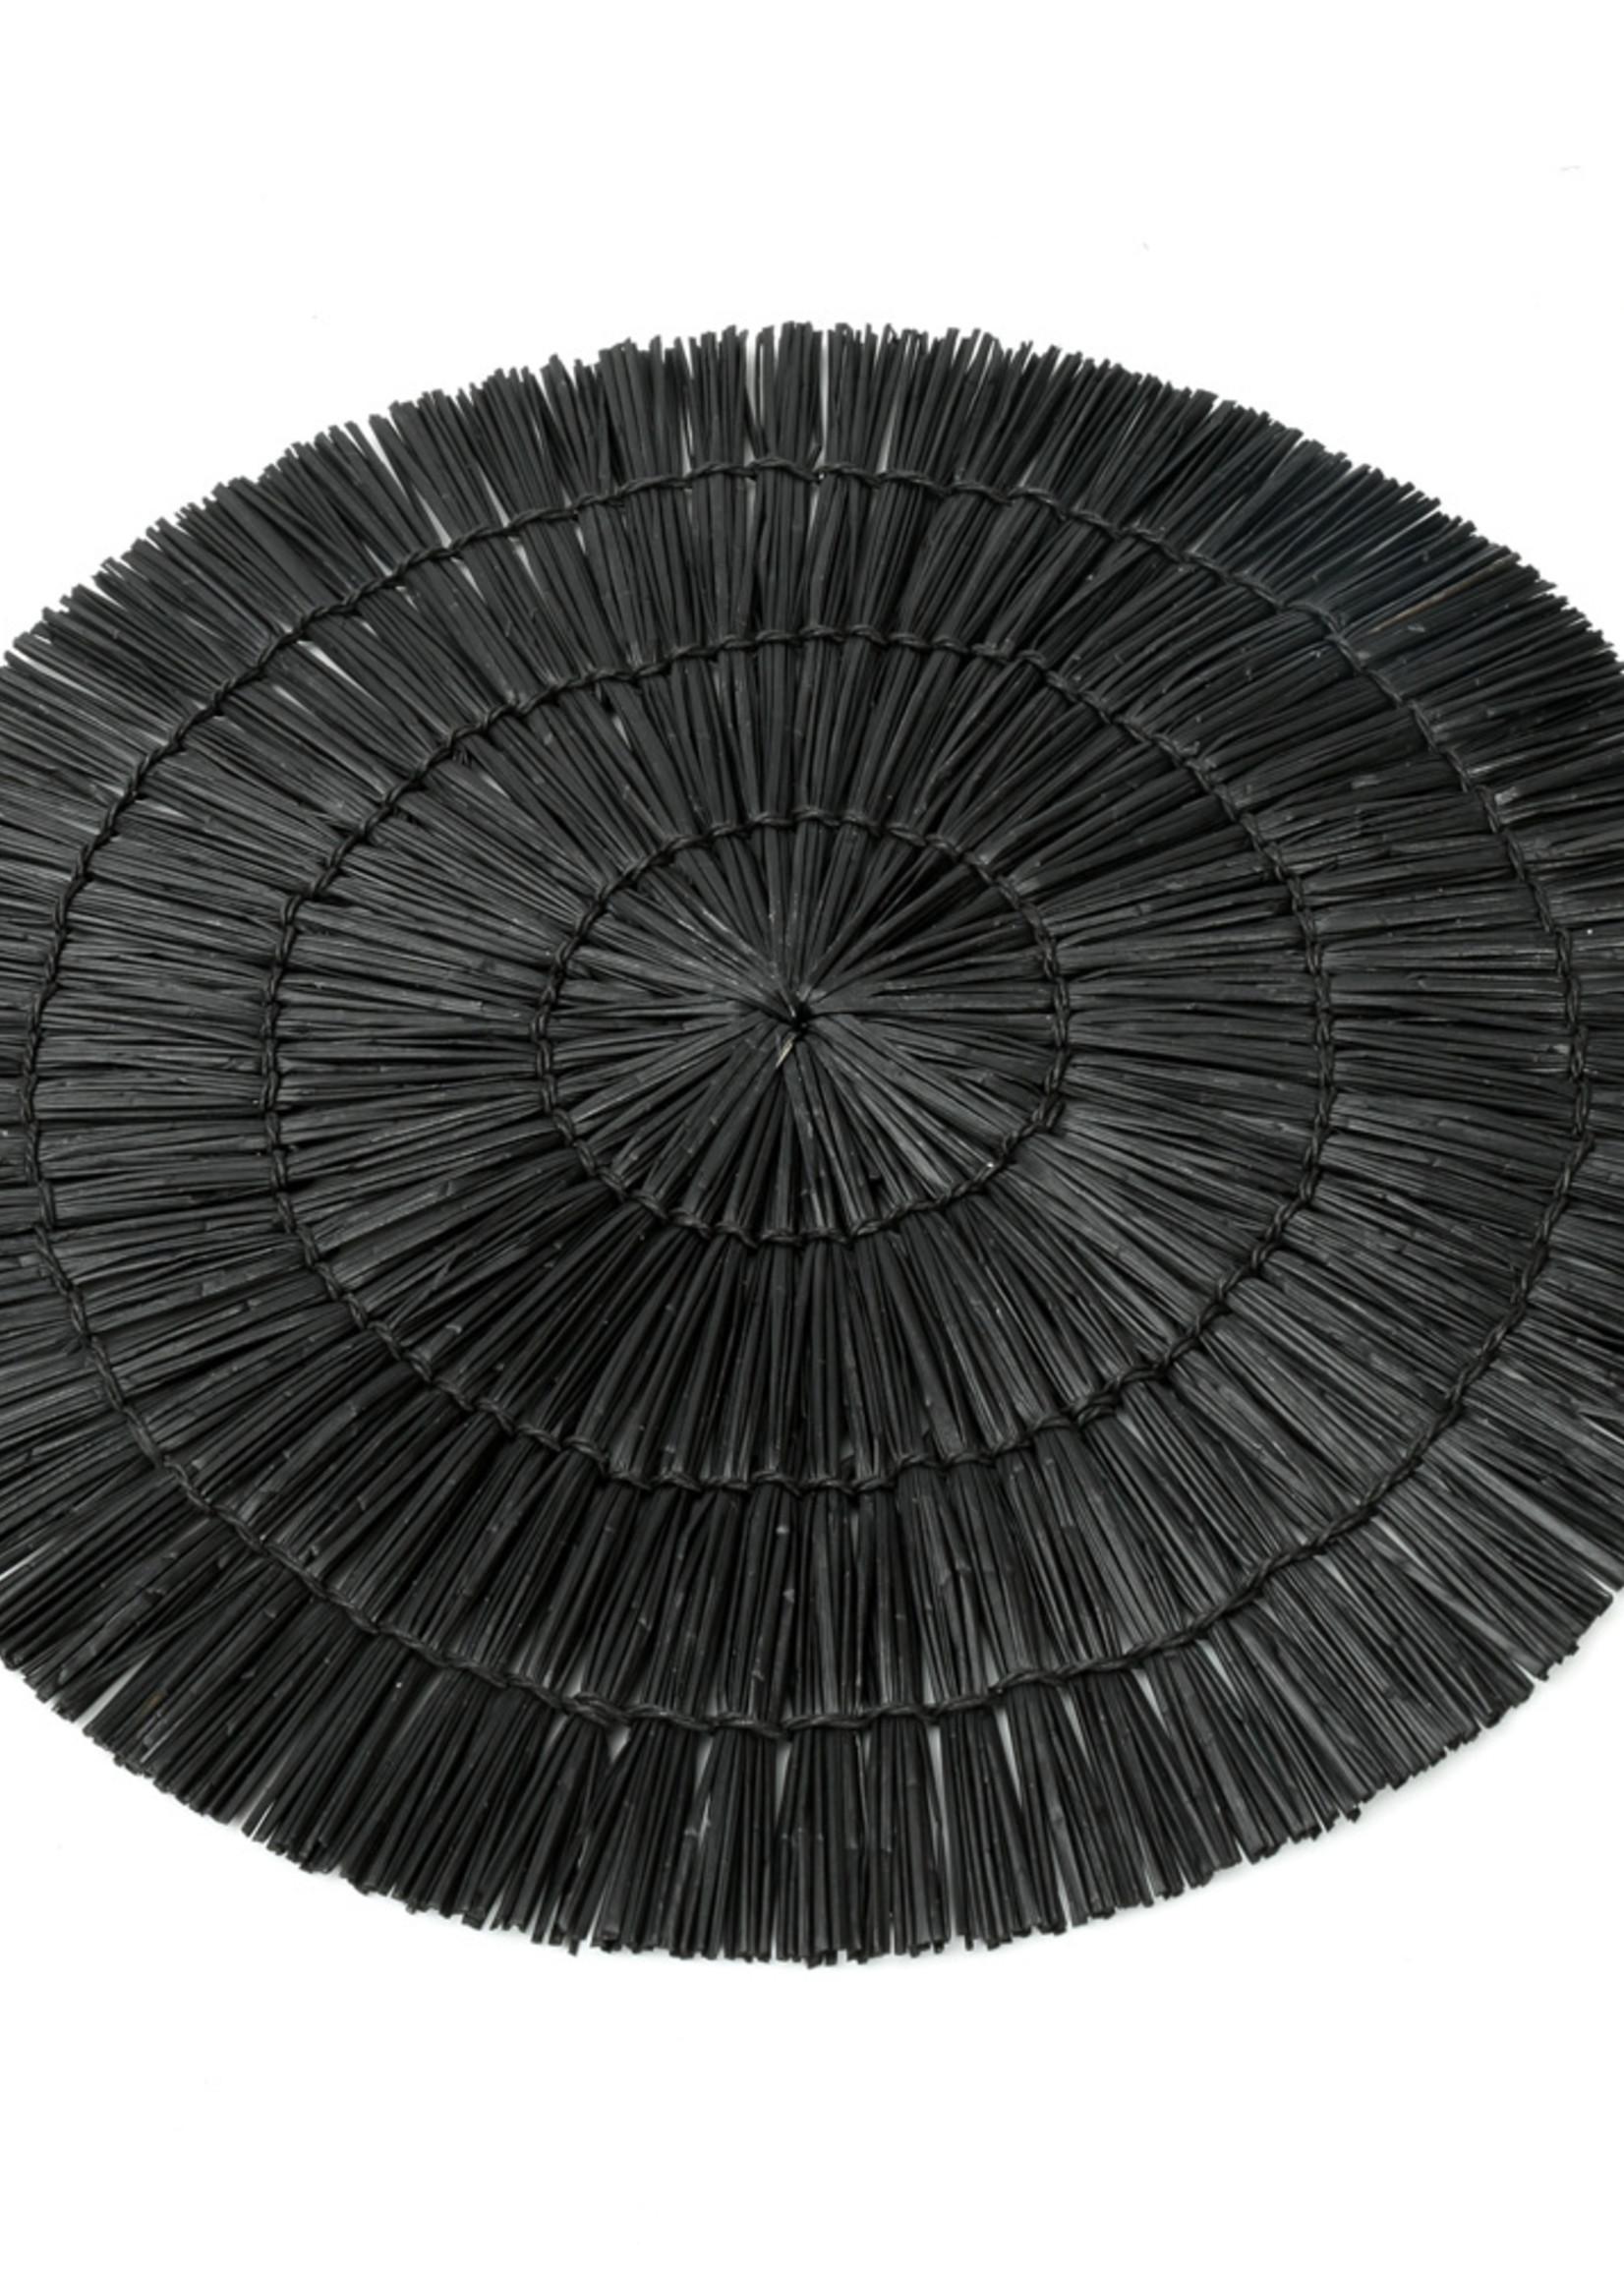 The Alang Alang Placemat - Round - Black